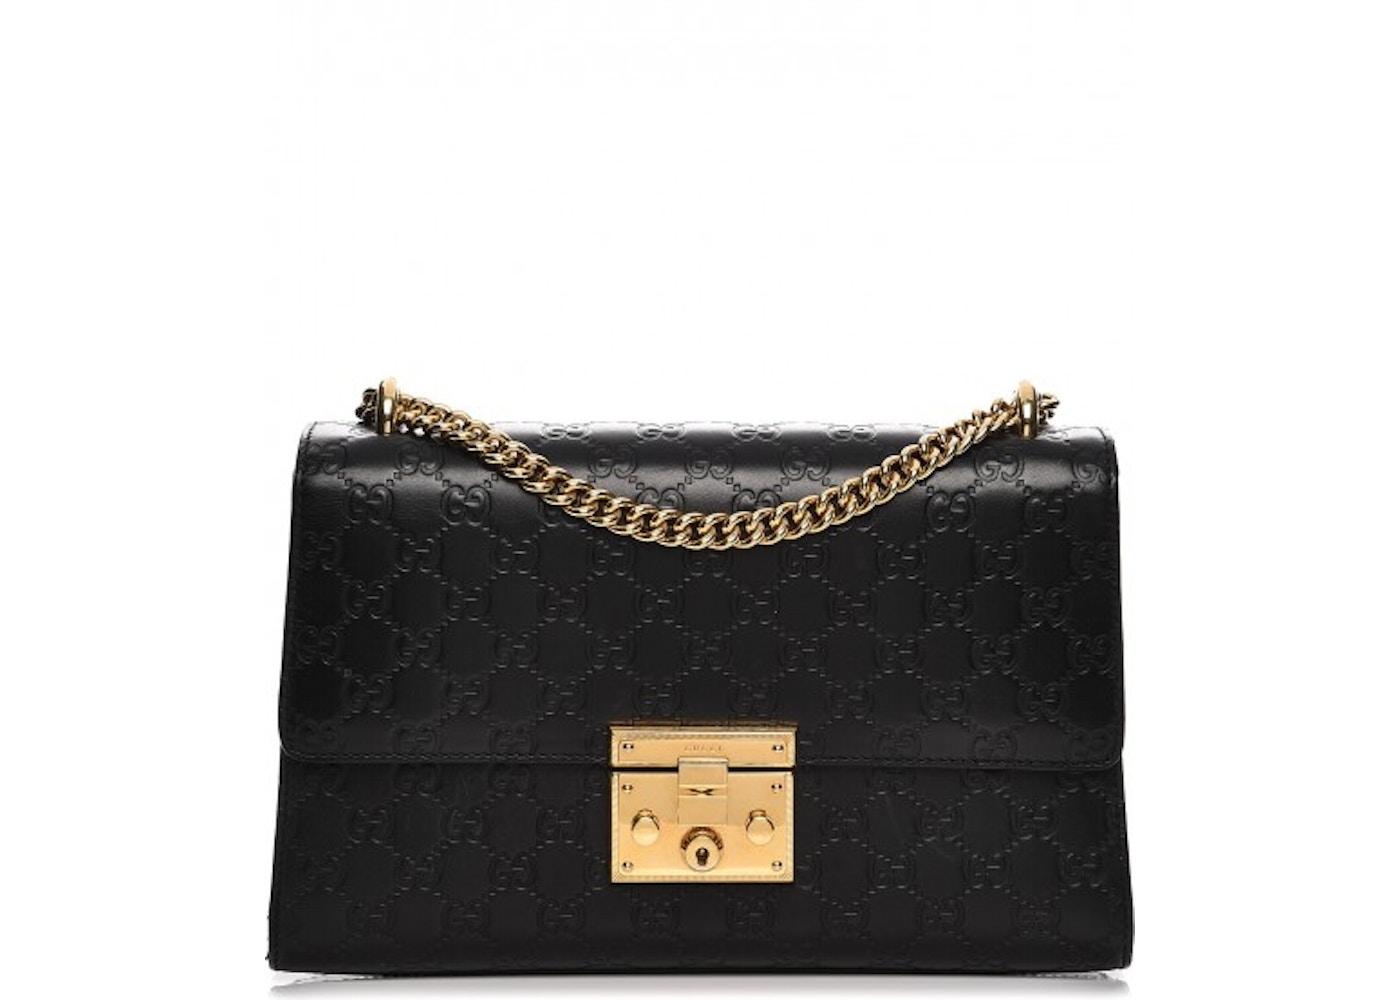 8614ebd2 Gucci Padlock Shoulder Bag Monogram Guccissima Medium Black. Monogram  Guccissima Medium Black